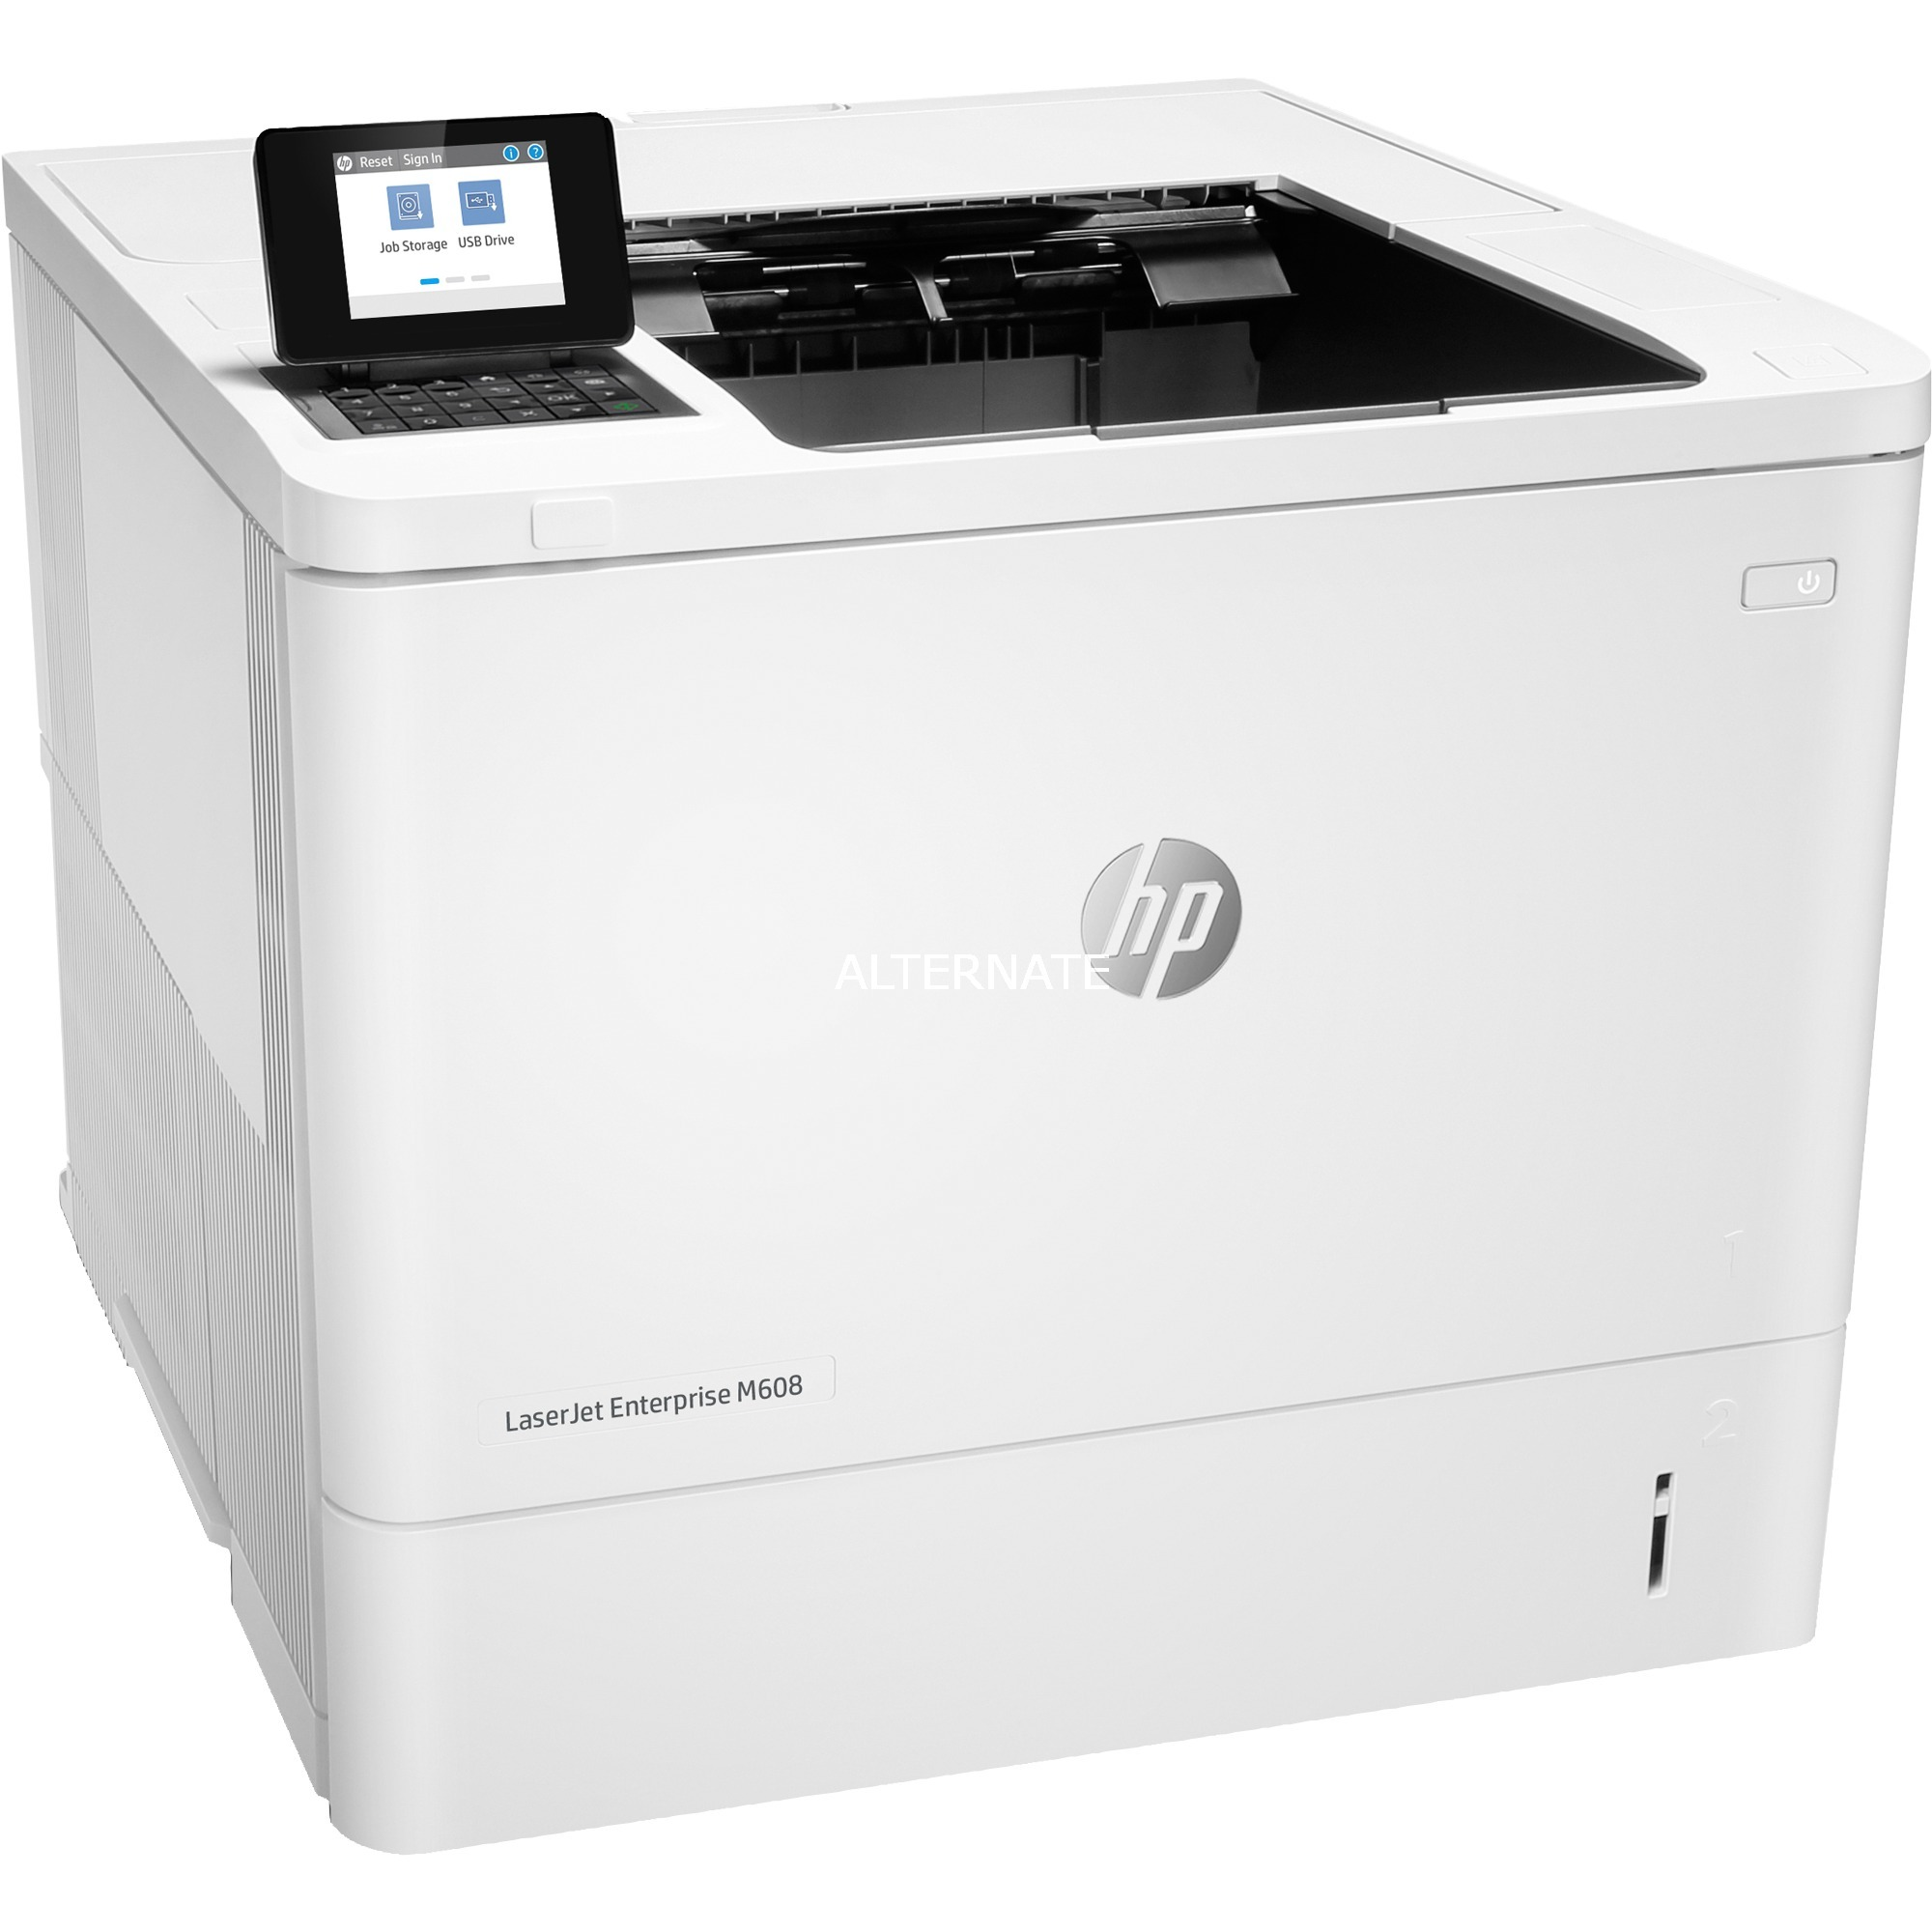 LaserJet Enterprise M608n 1200 x 1200 DPI A4, Impresora láser